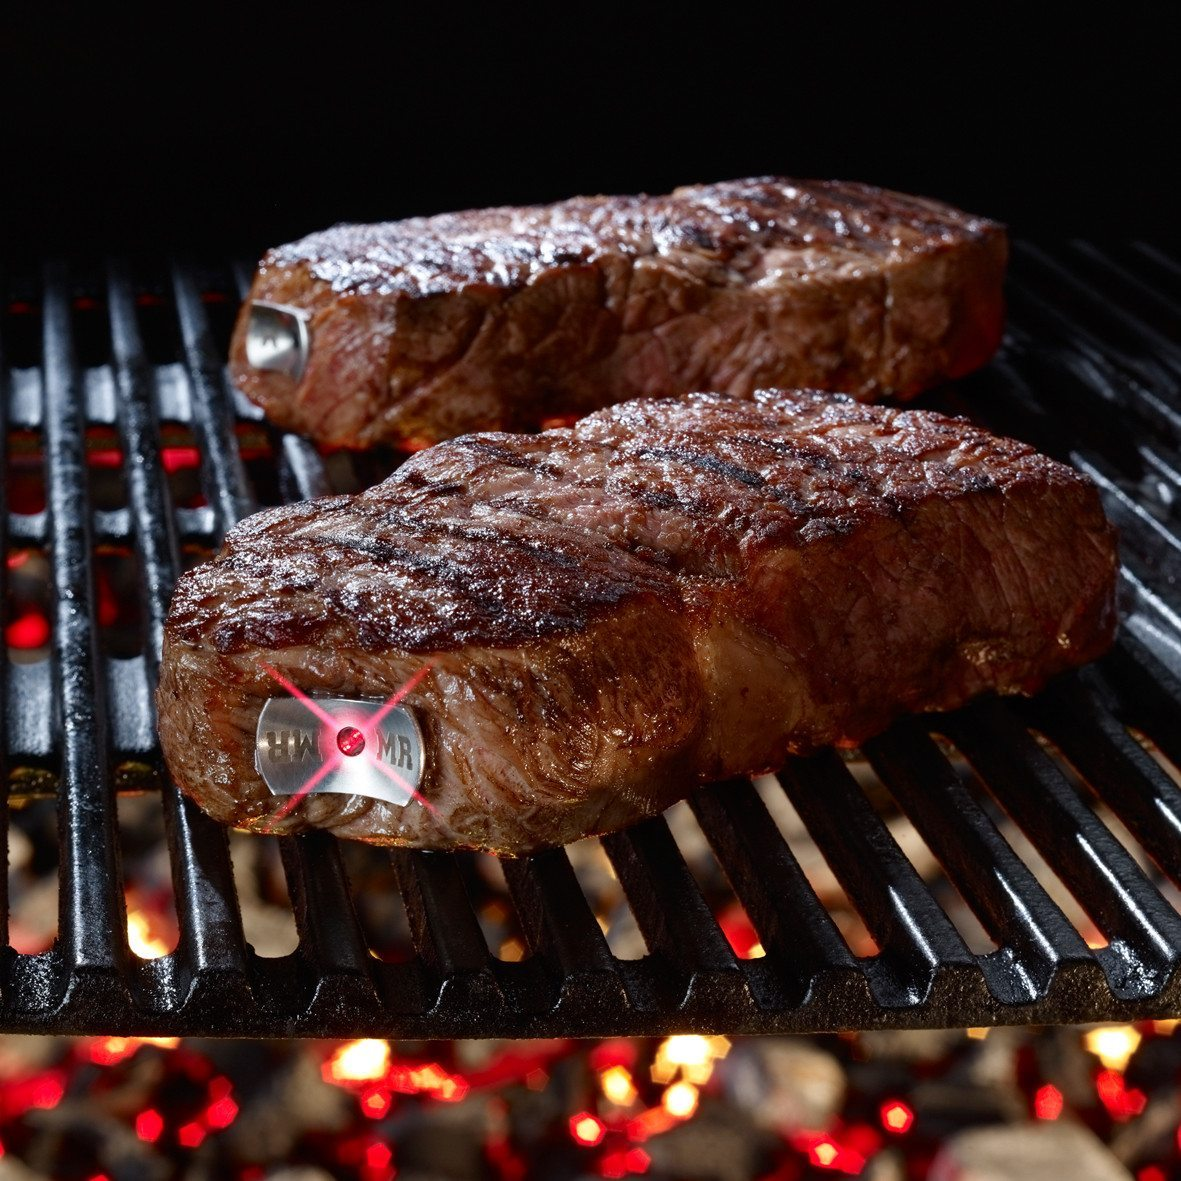 SteakChamp Fleischthermometer 2er-Pack, medium + medium rare